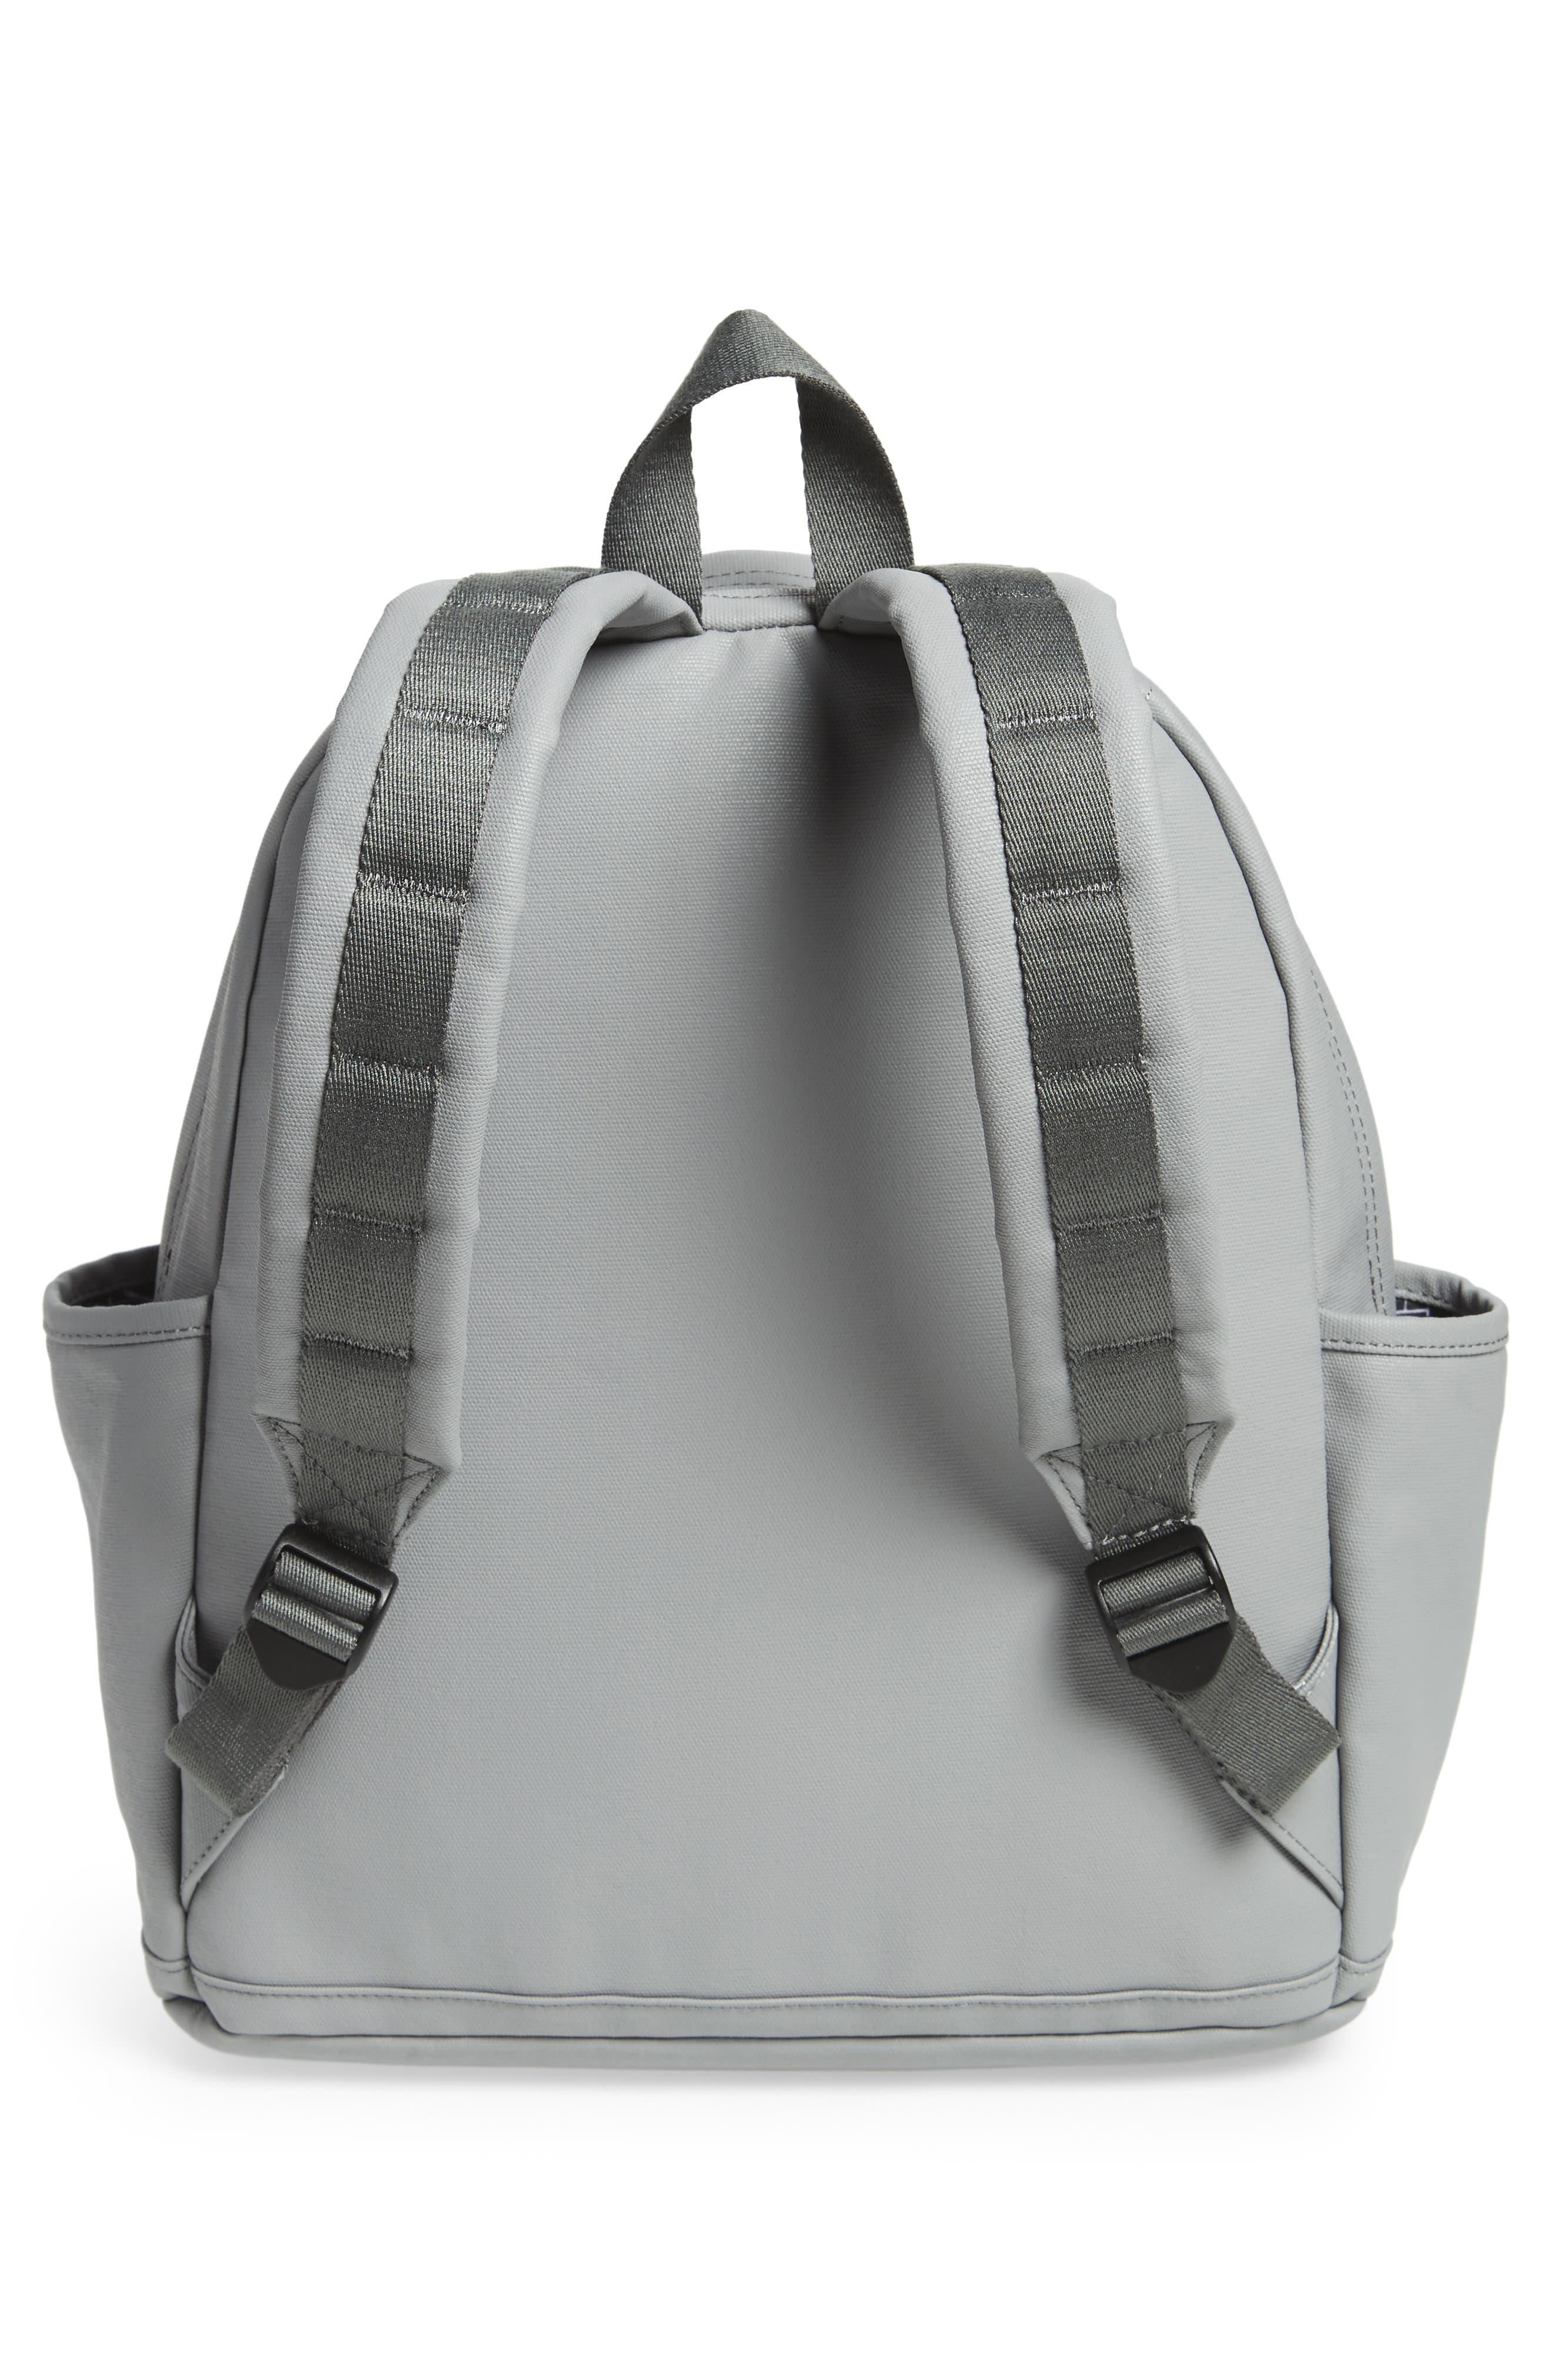 Greenpoint Kent Backpack,                             Alternate thumbnail 3, color,                             020